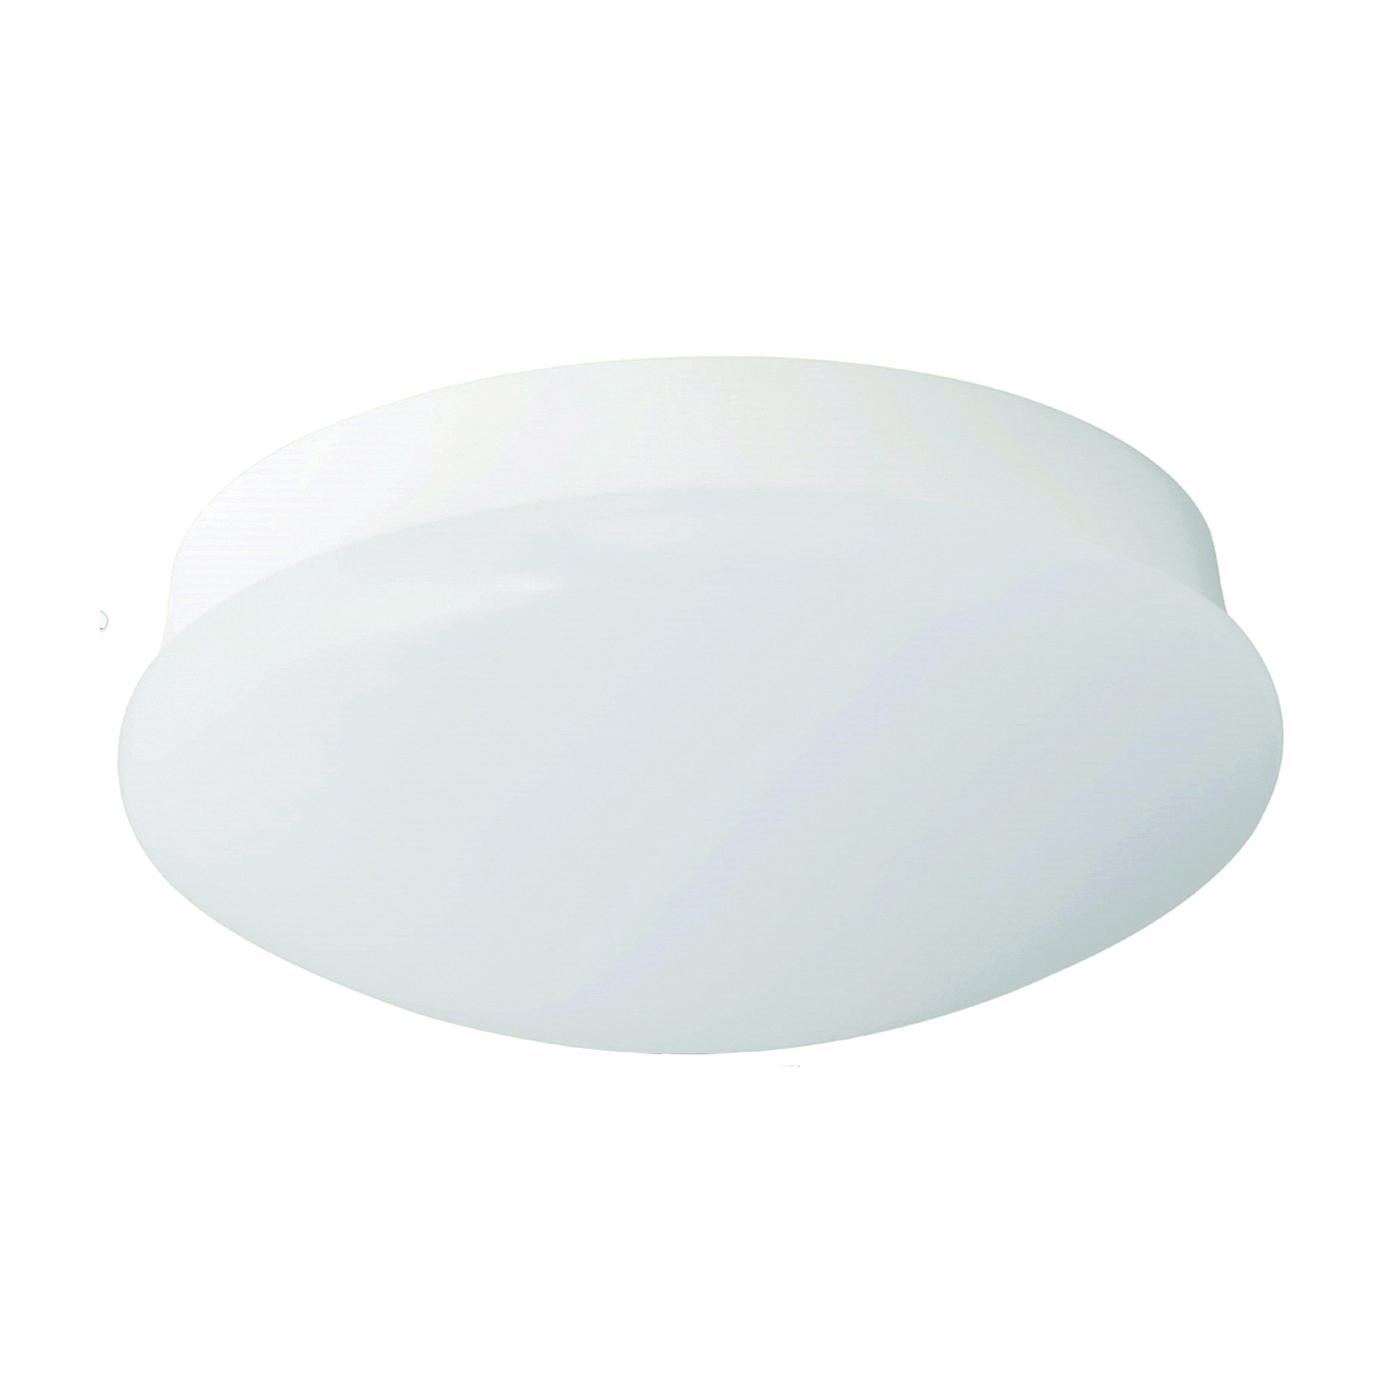 Picture of ETI 54652141 Spin Light Fixture, 120 V, 22 W, 1-Lamp, LED Lamp, 1600 Lumens, 4000 K Color Temp